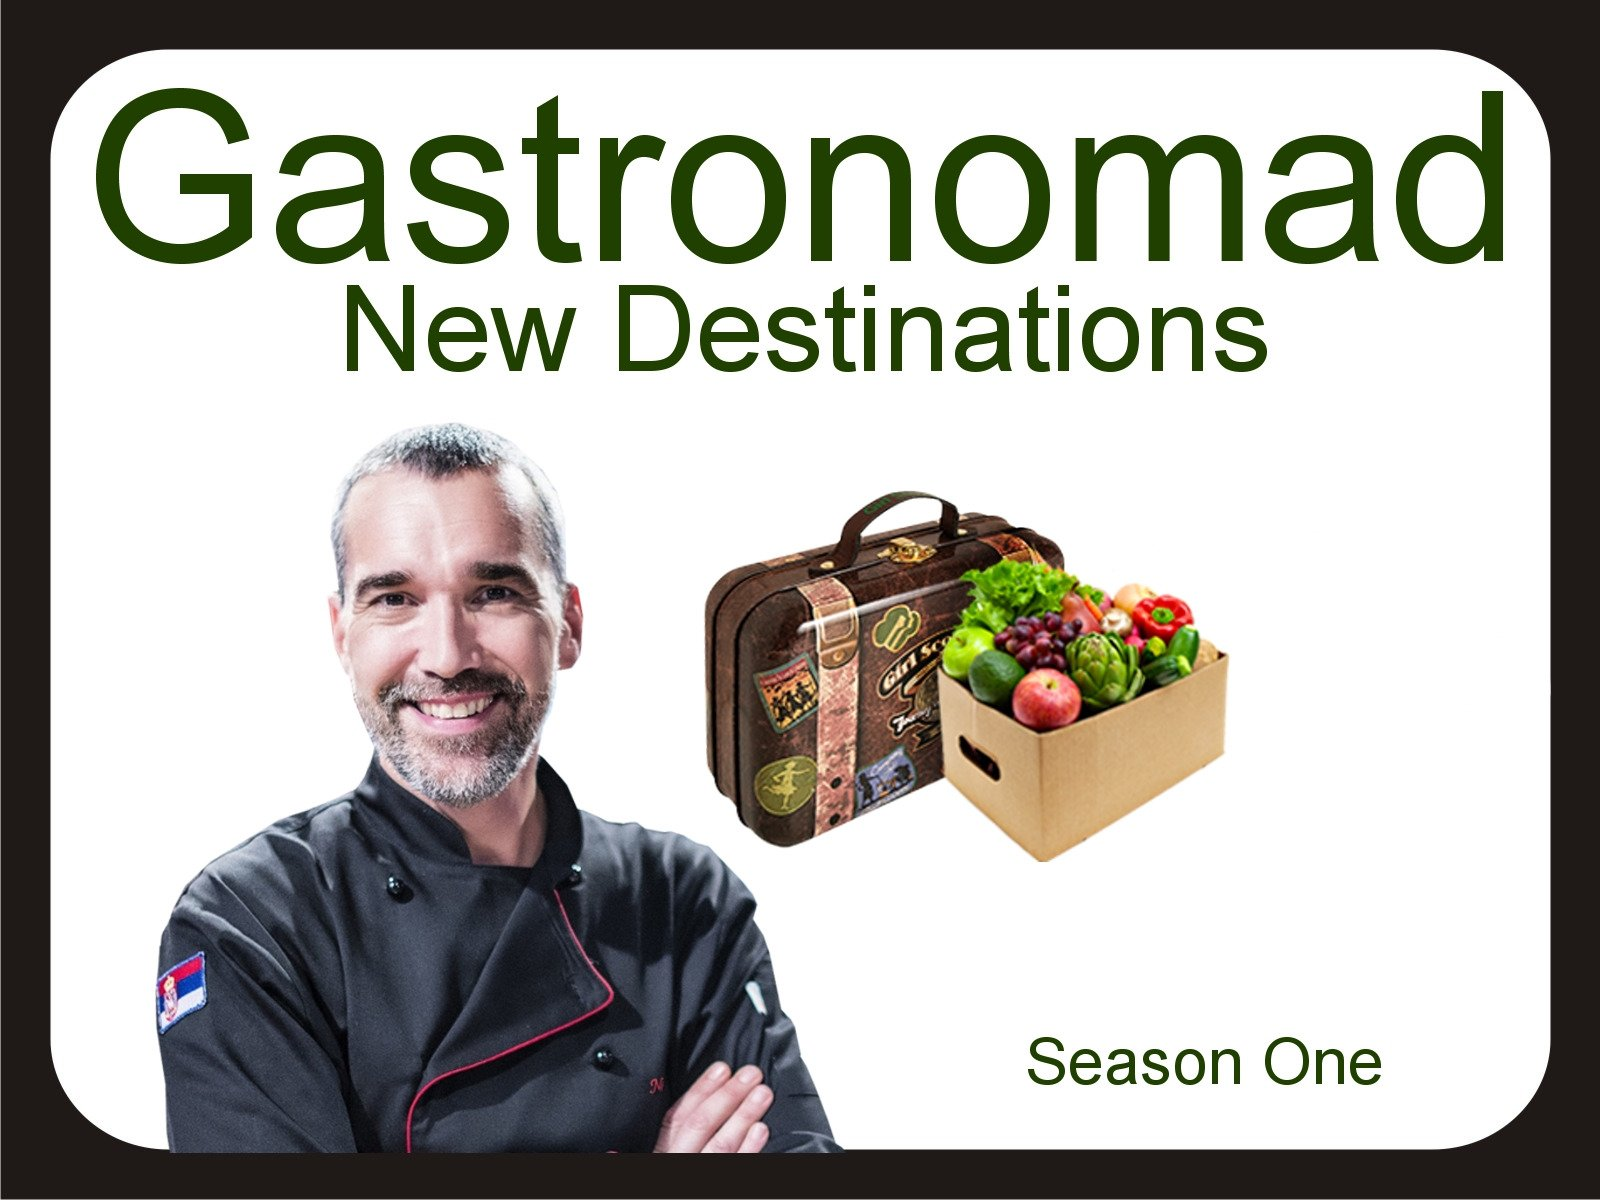 Gastronomad: New Destinations - Season 1